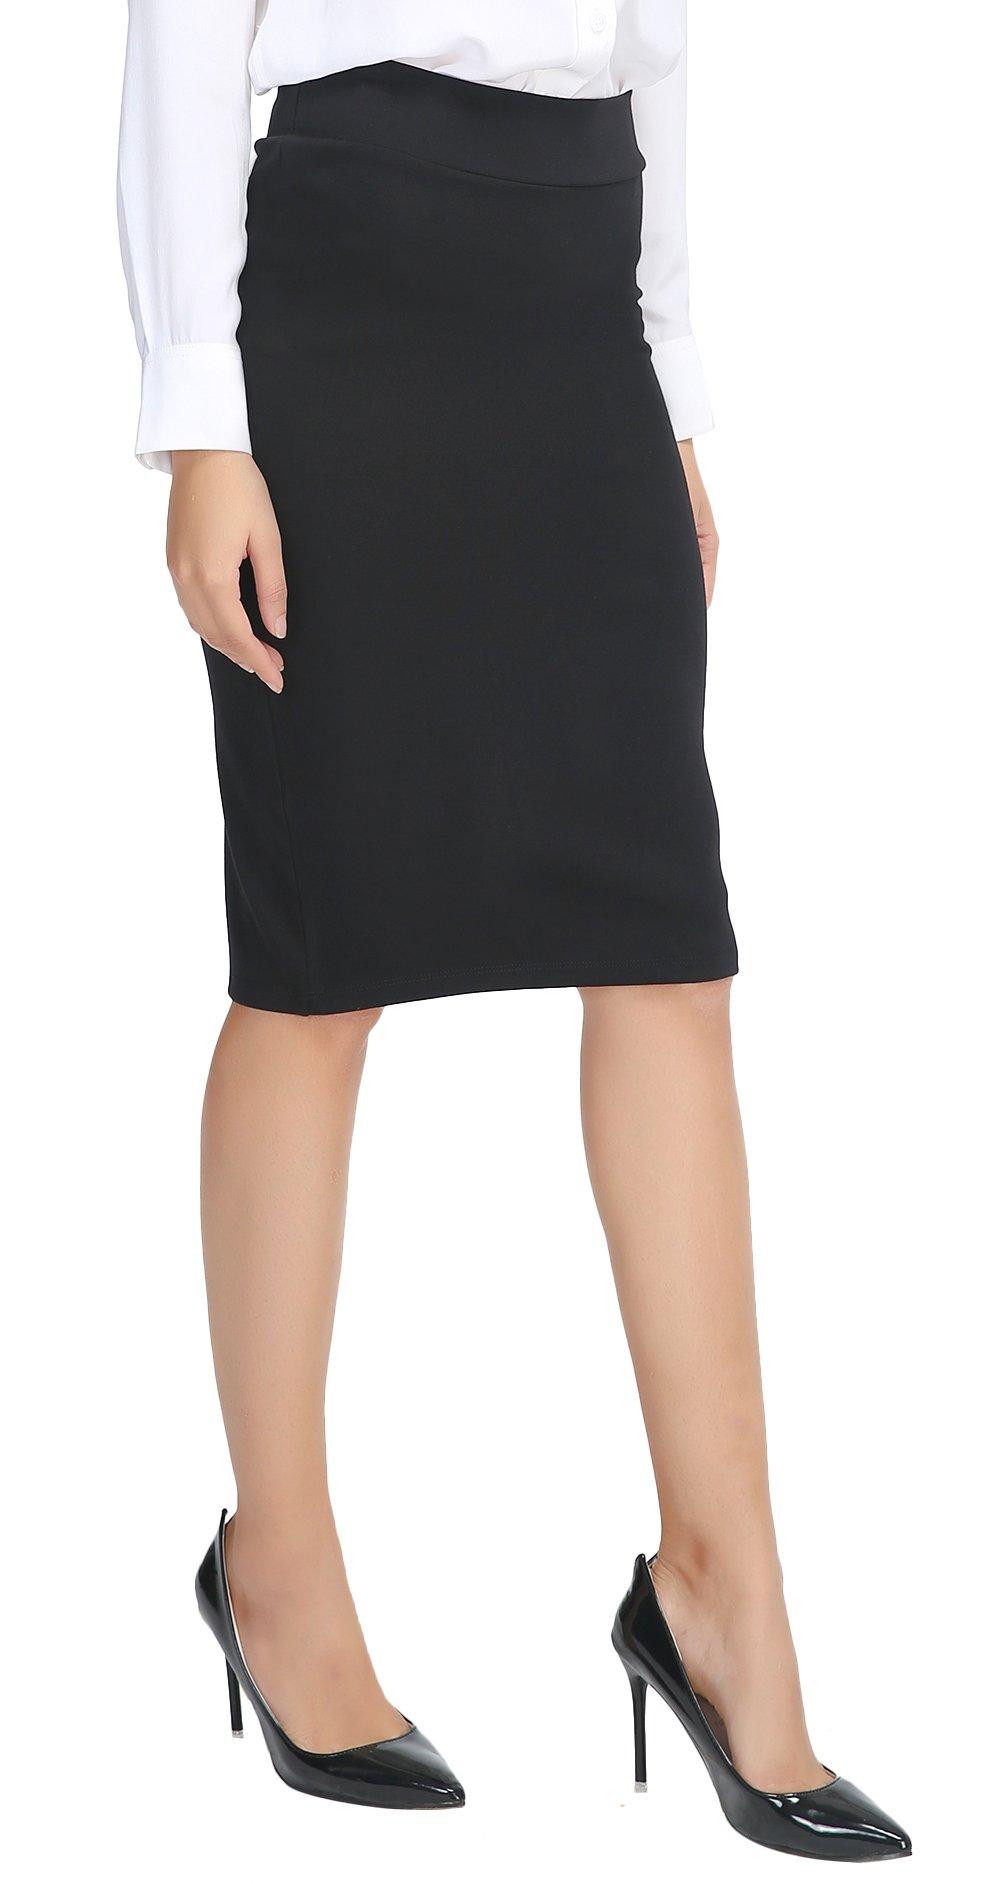 Urban CoCo Women's Elastic Waist Stretch Bodycon Midi Pencil Skirt (XL, Black)